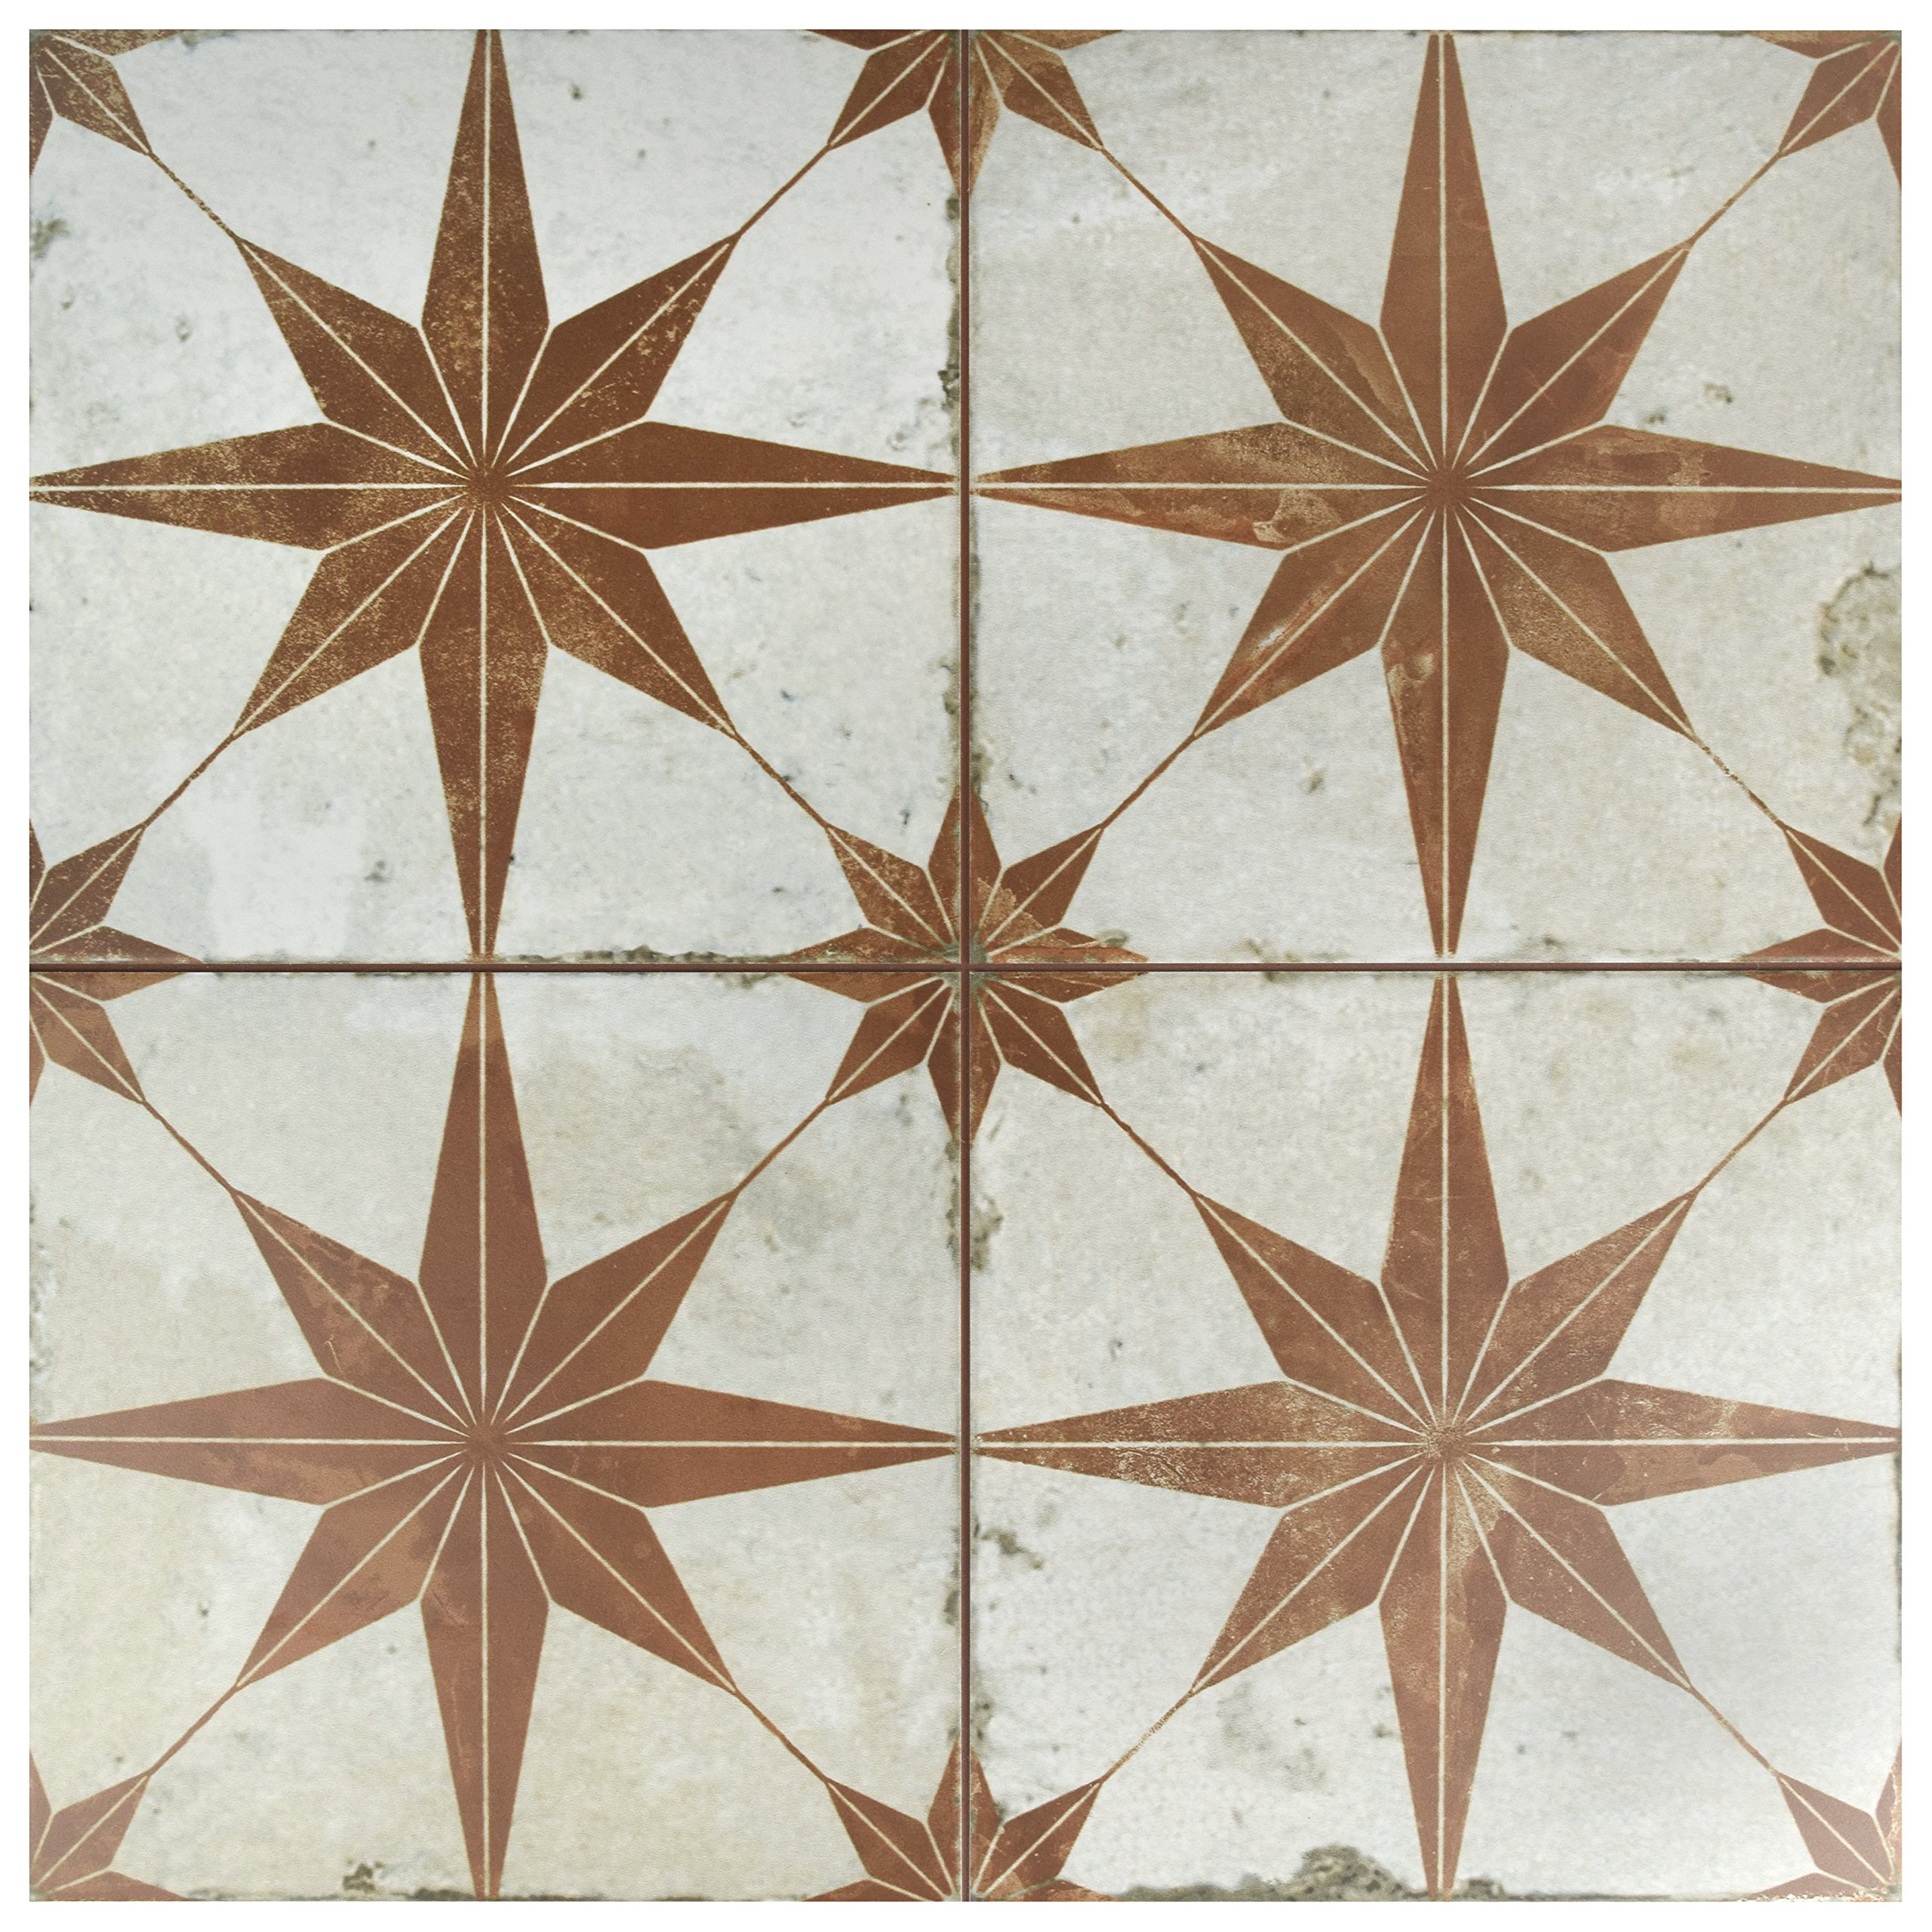 SomerTile FPESTRO Astre Ceramic Floor and Wall Tile, Oxide